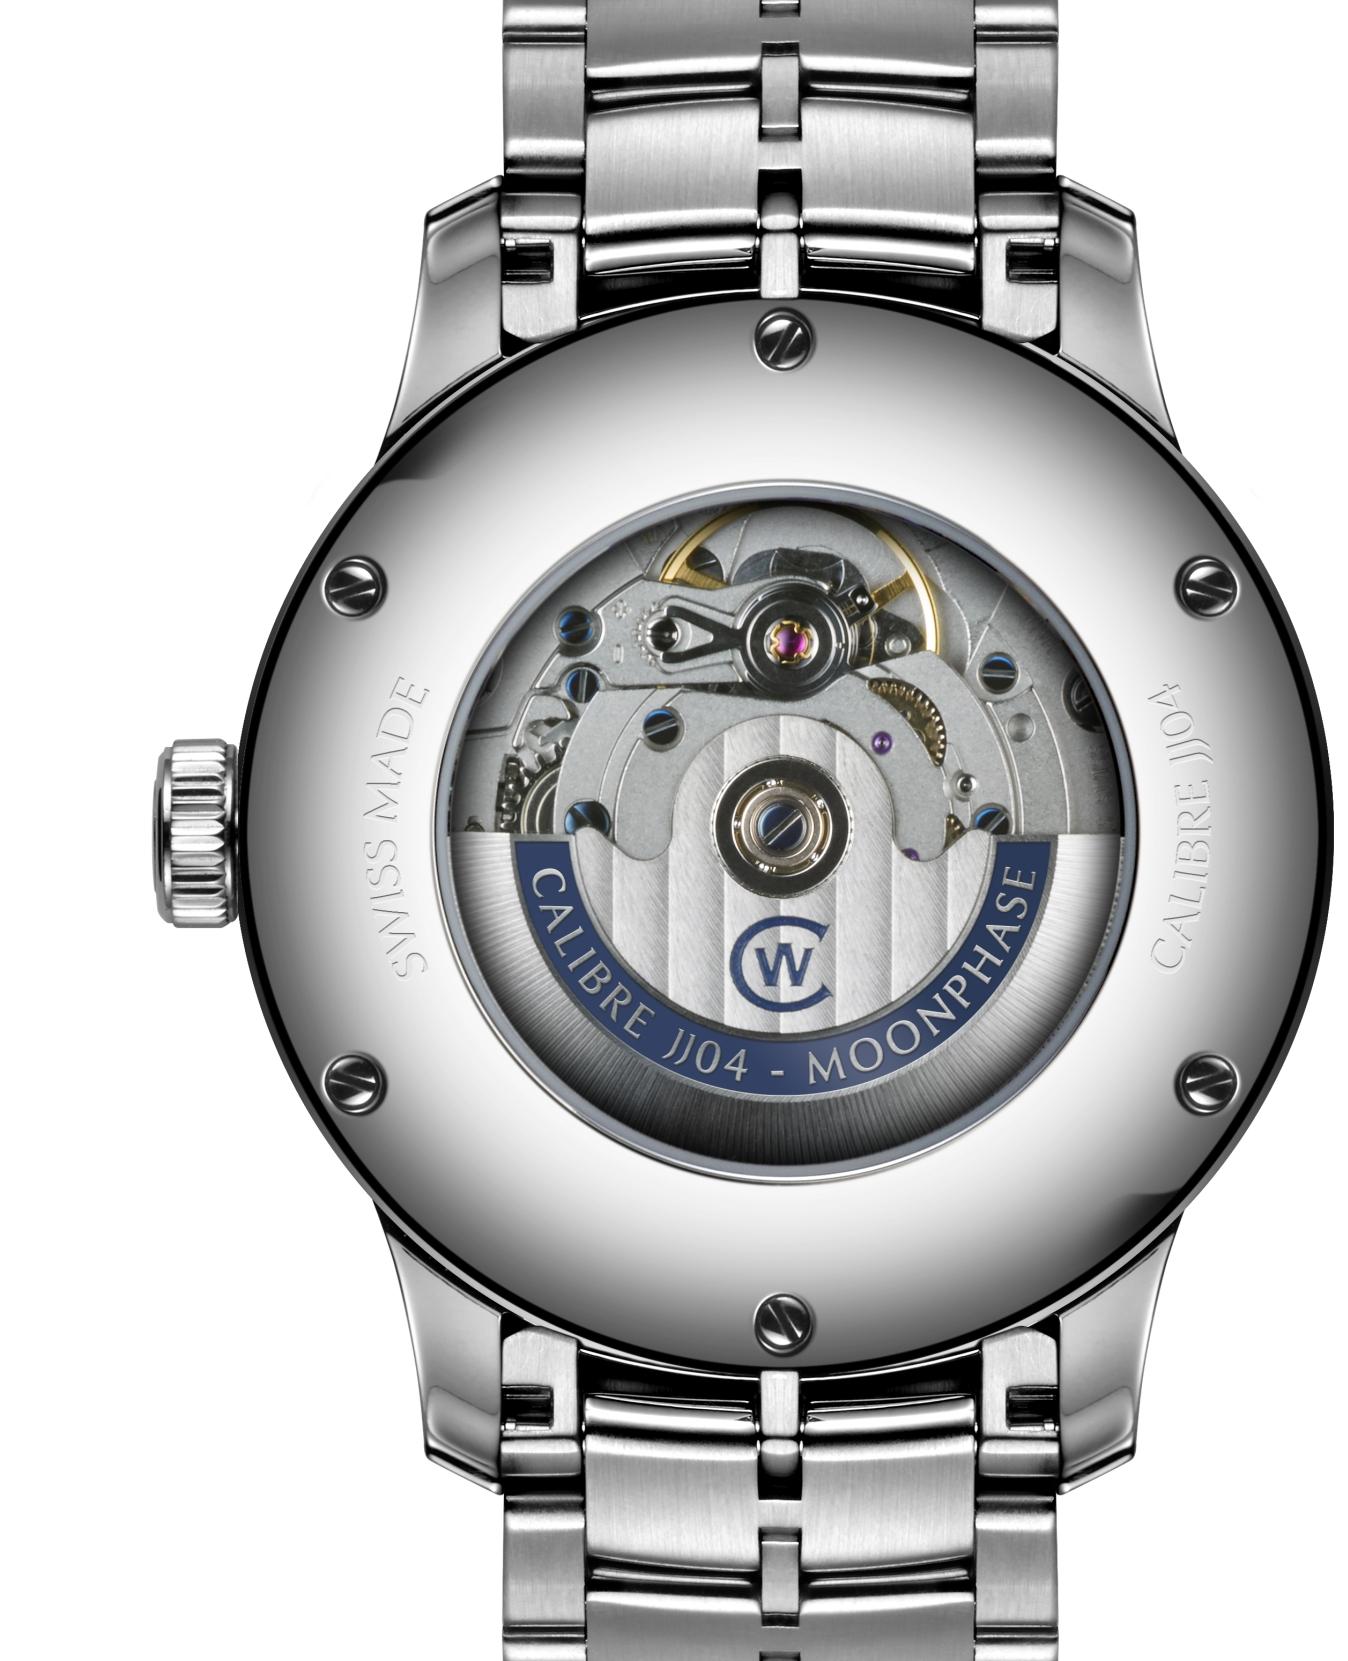 Christopher Ward's C9 Moonphase Chr-christopher-ward-c9-moonphase-wristwatch-transparent-back